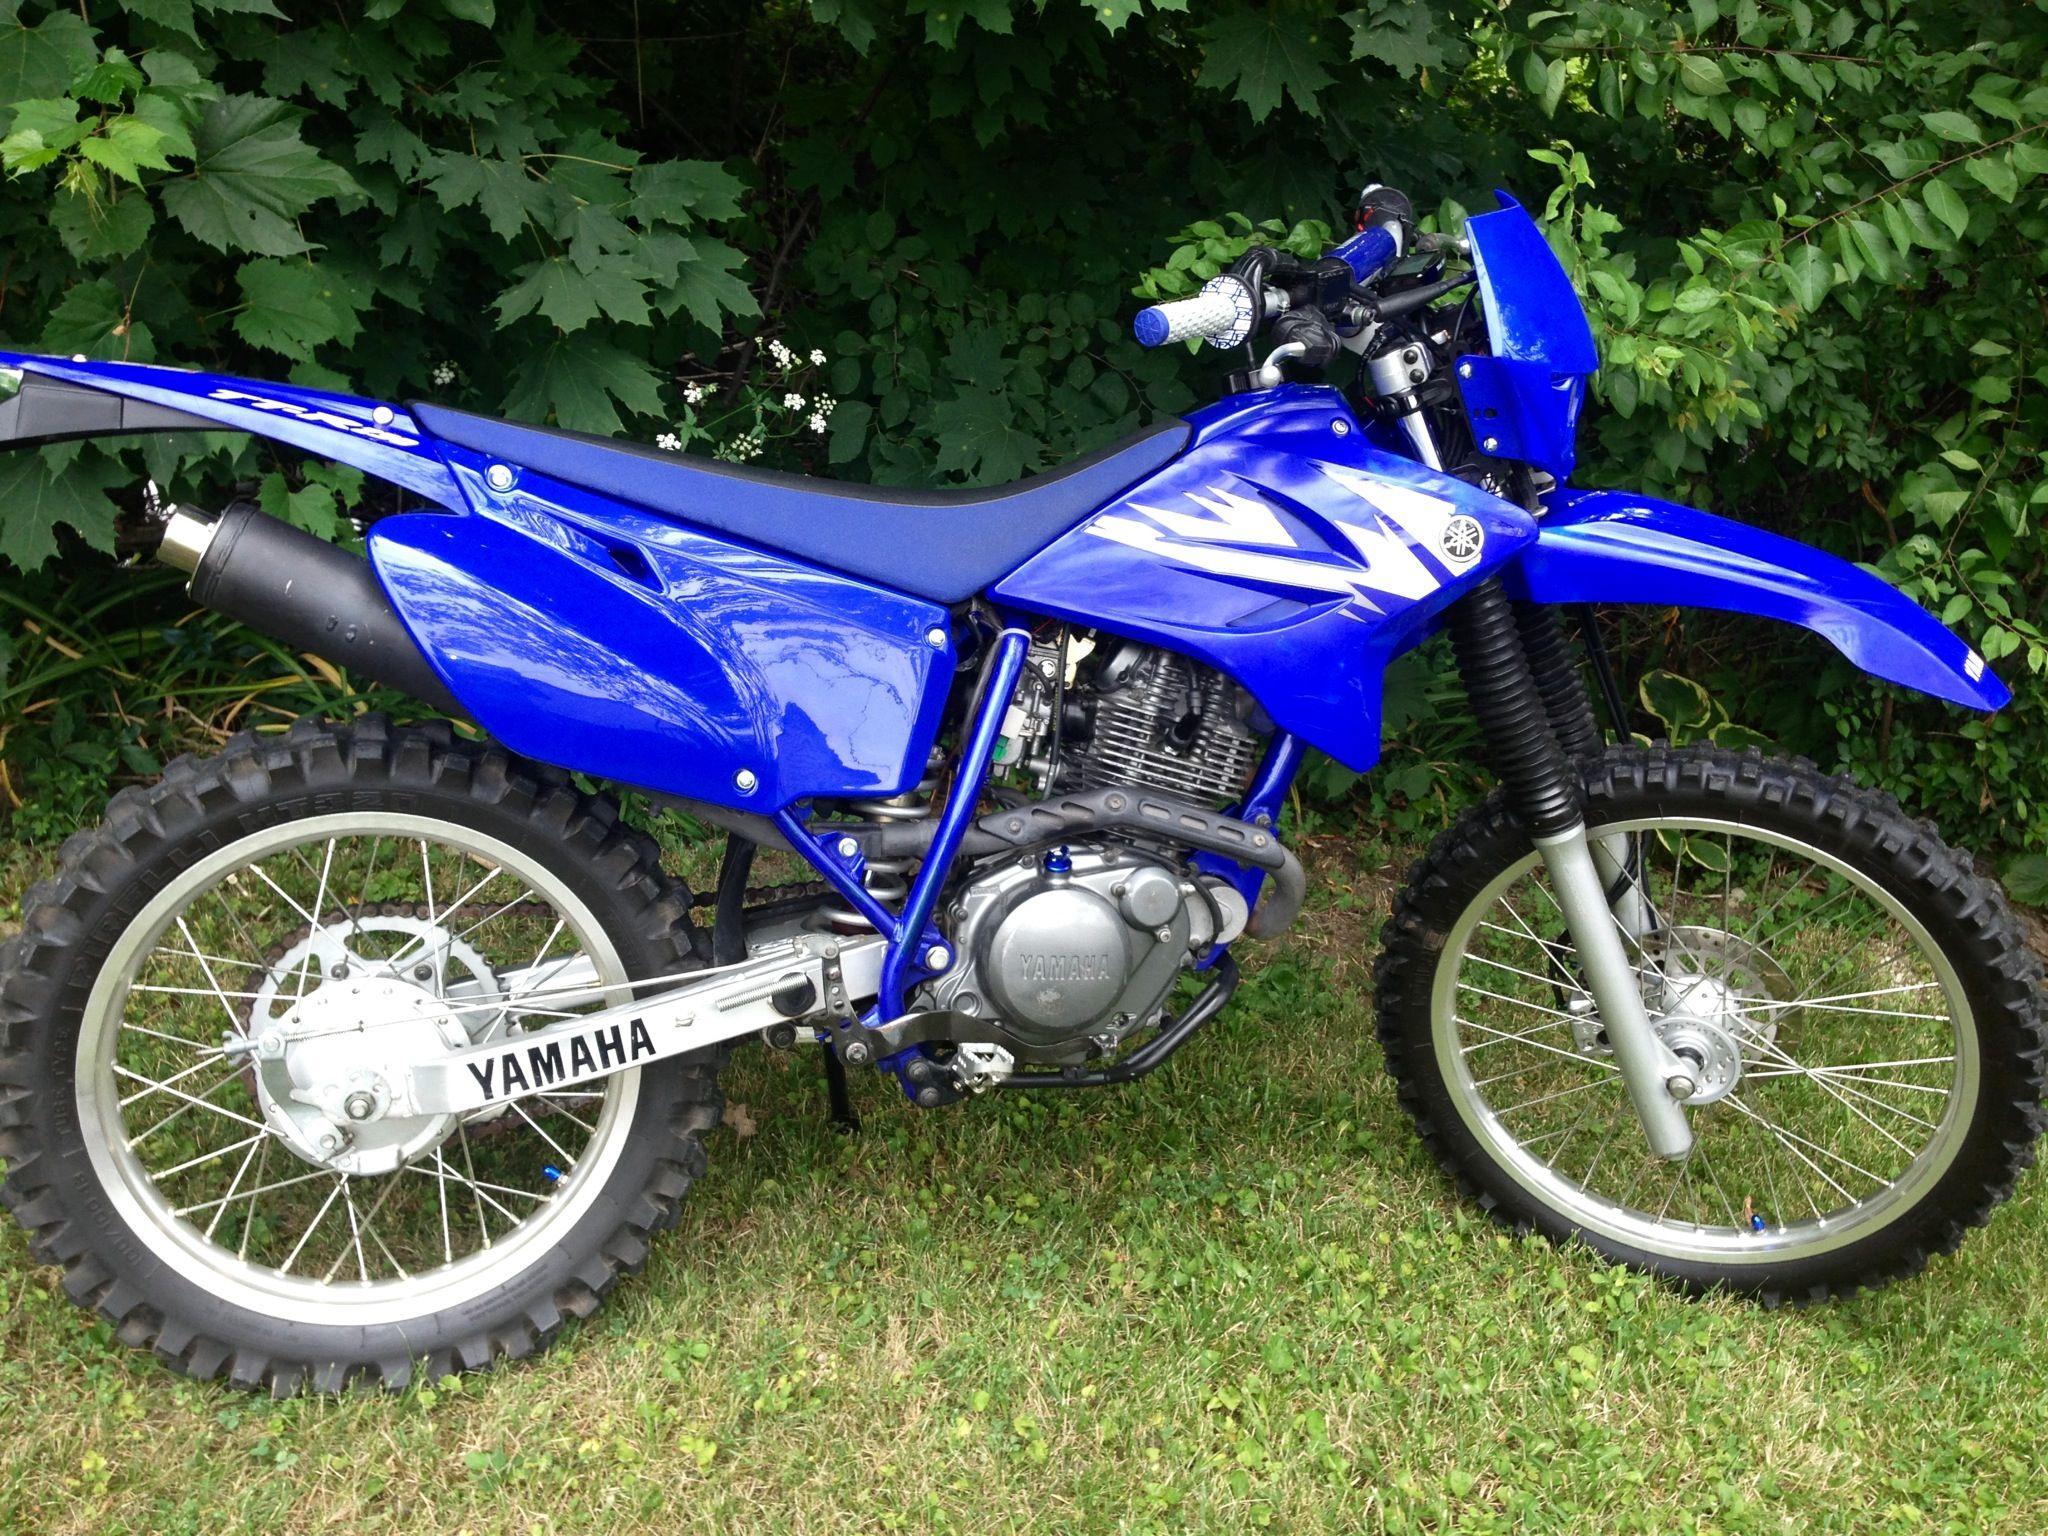 Yamaha Ttr 230 >> Yamaha Ttr 230 U Know How I Roll Dirtbikes Yamaha Lets